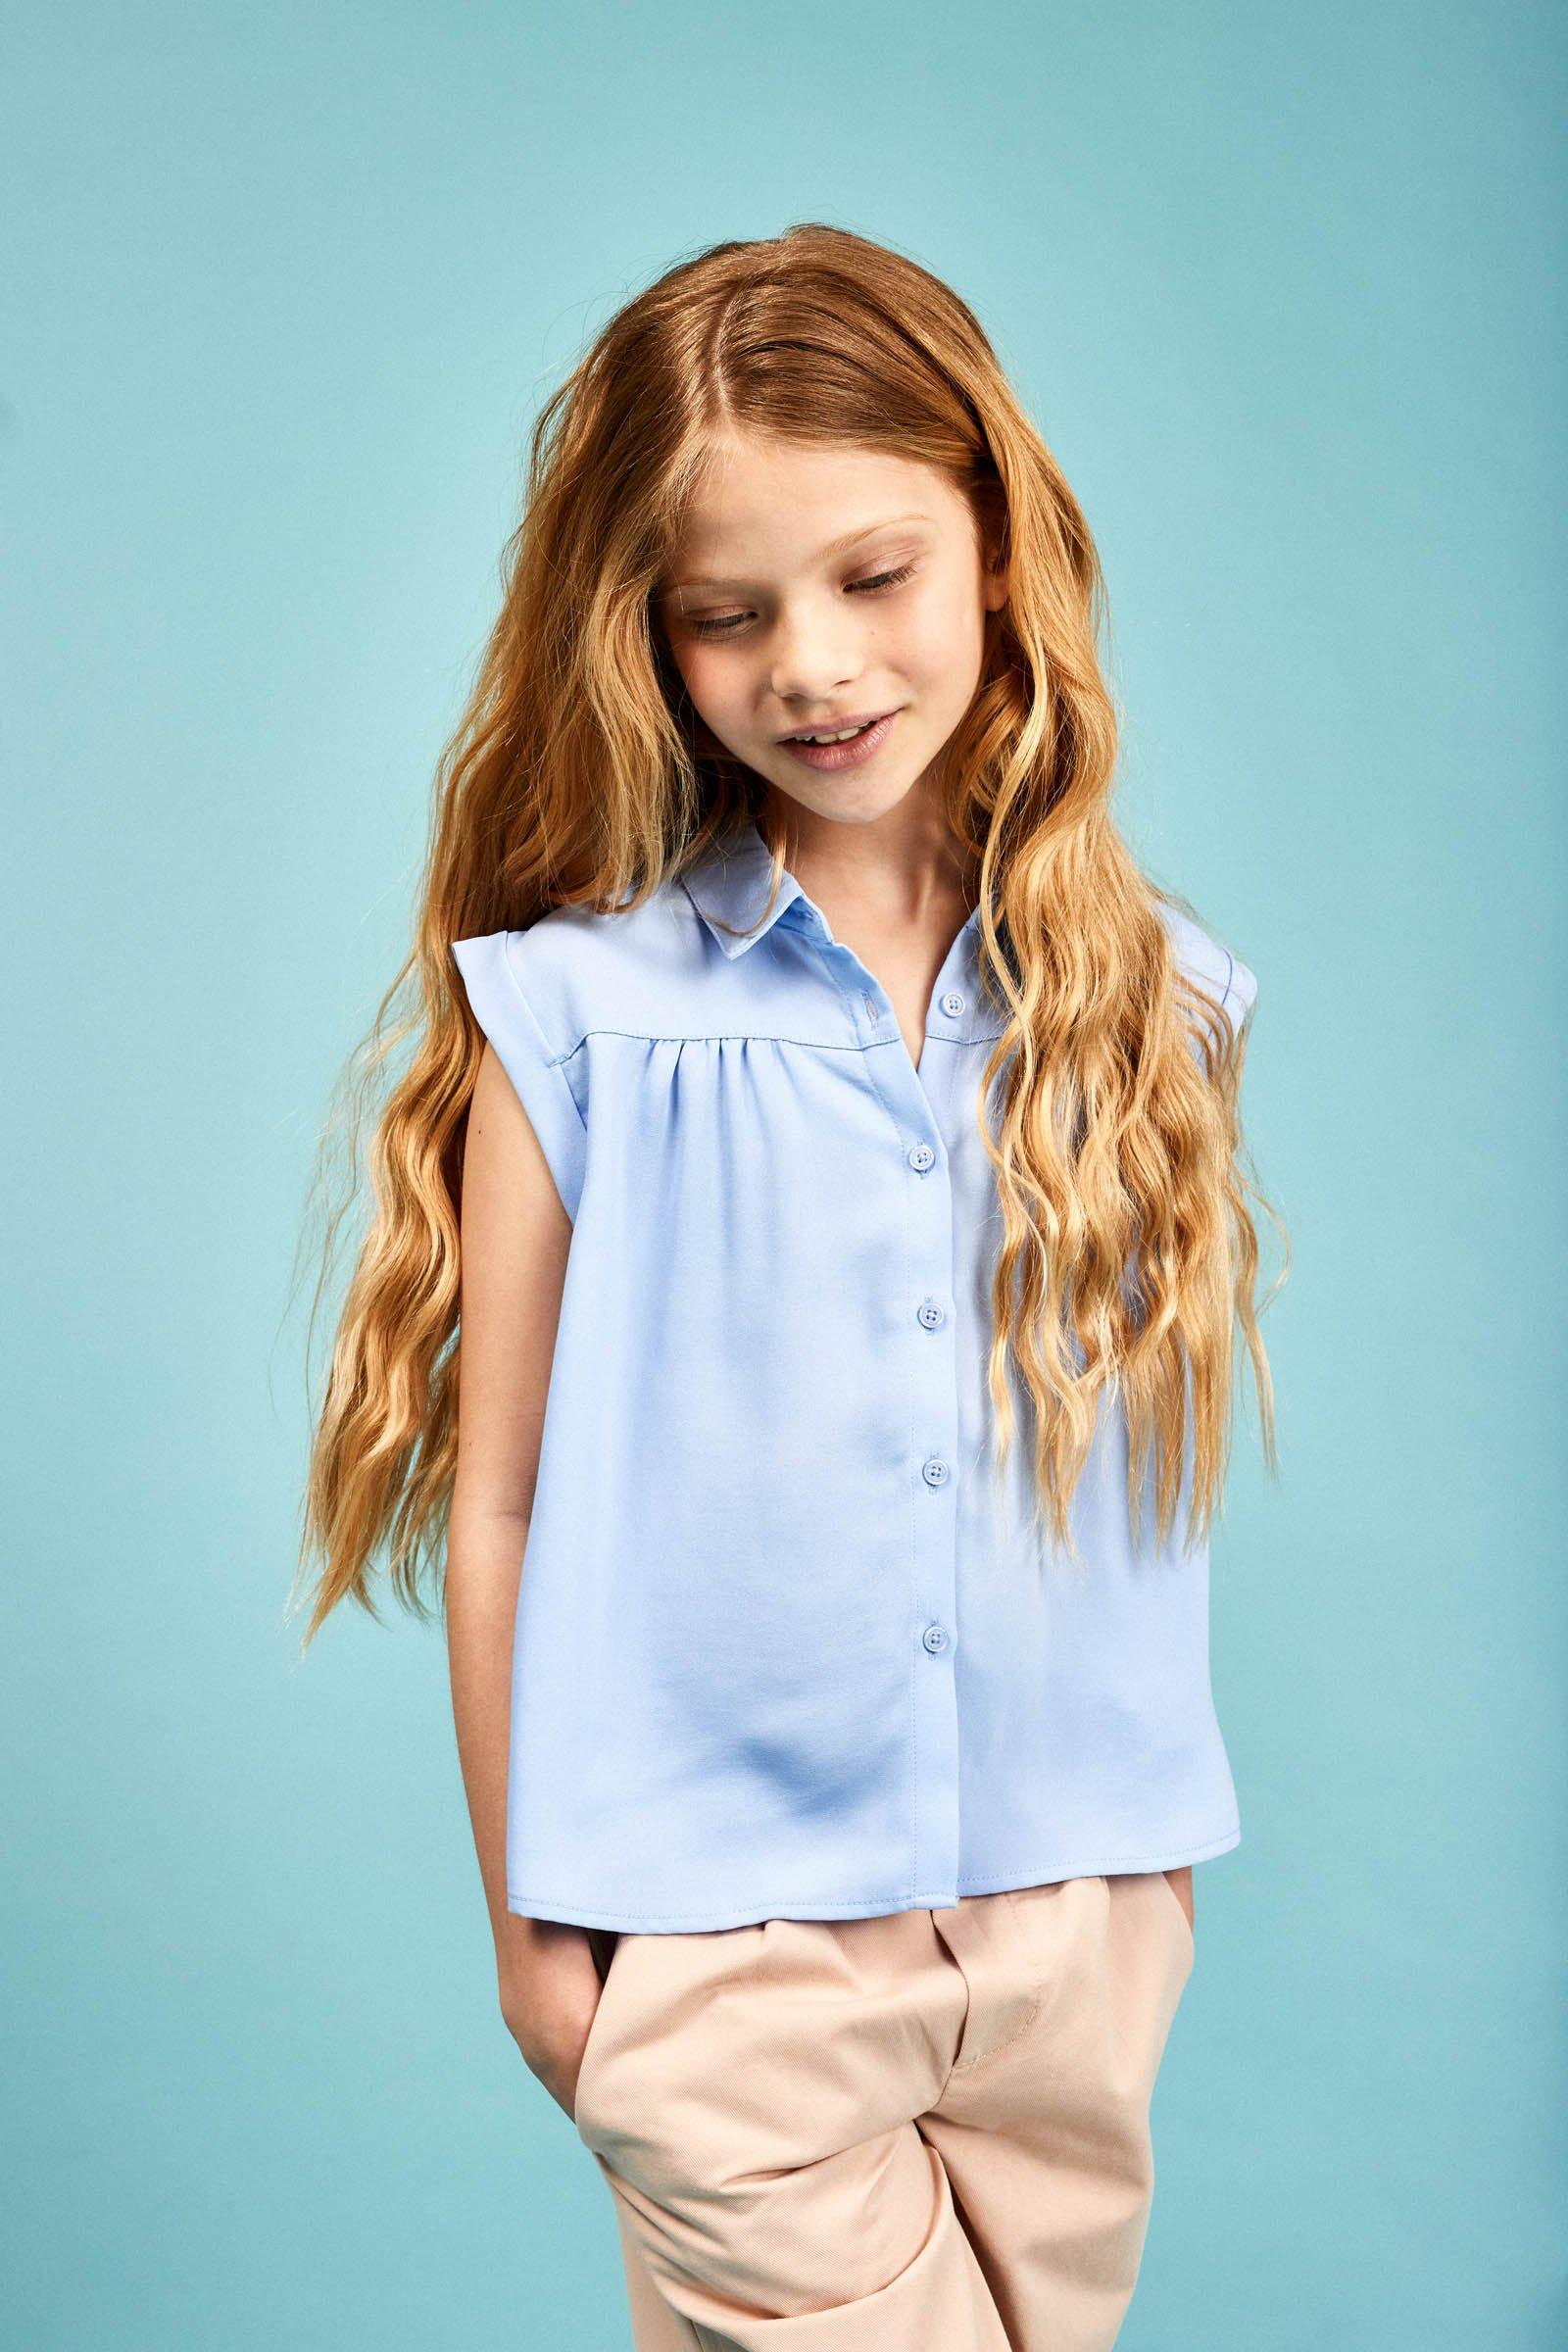 CKS Kids - ECHO - blouse lange mouwen - blauw